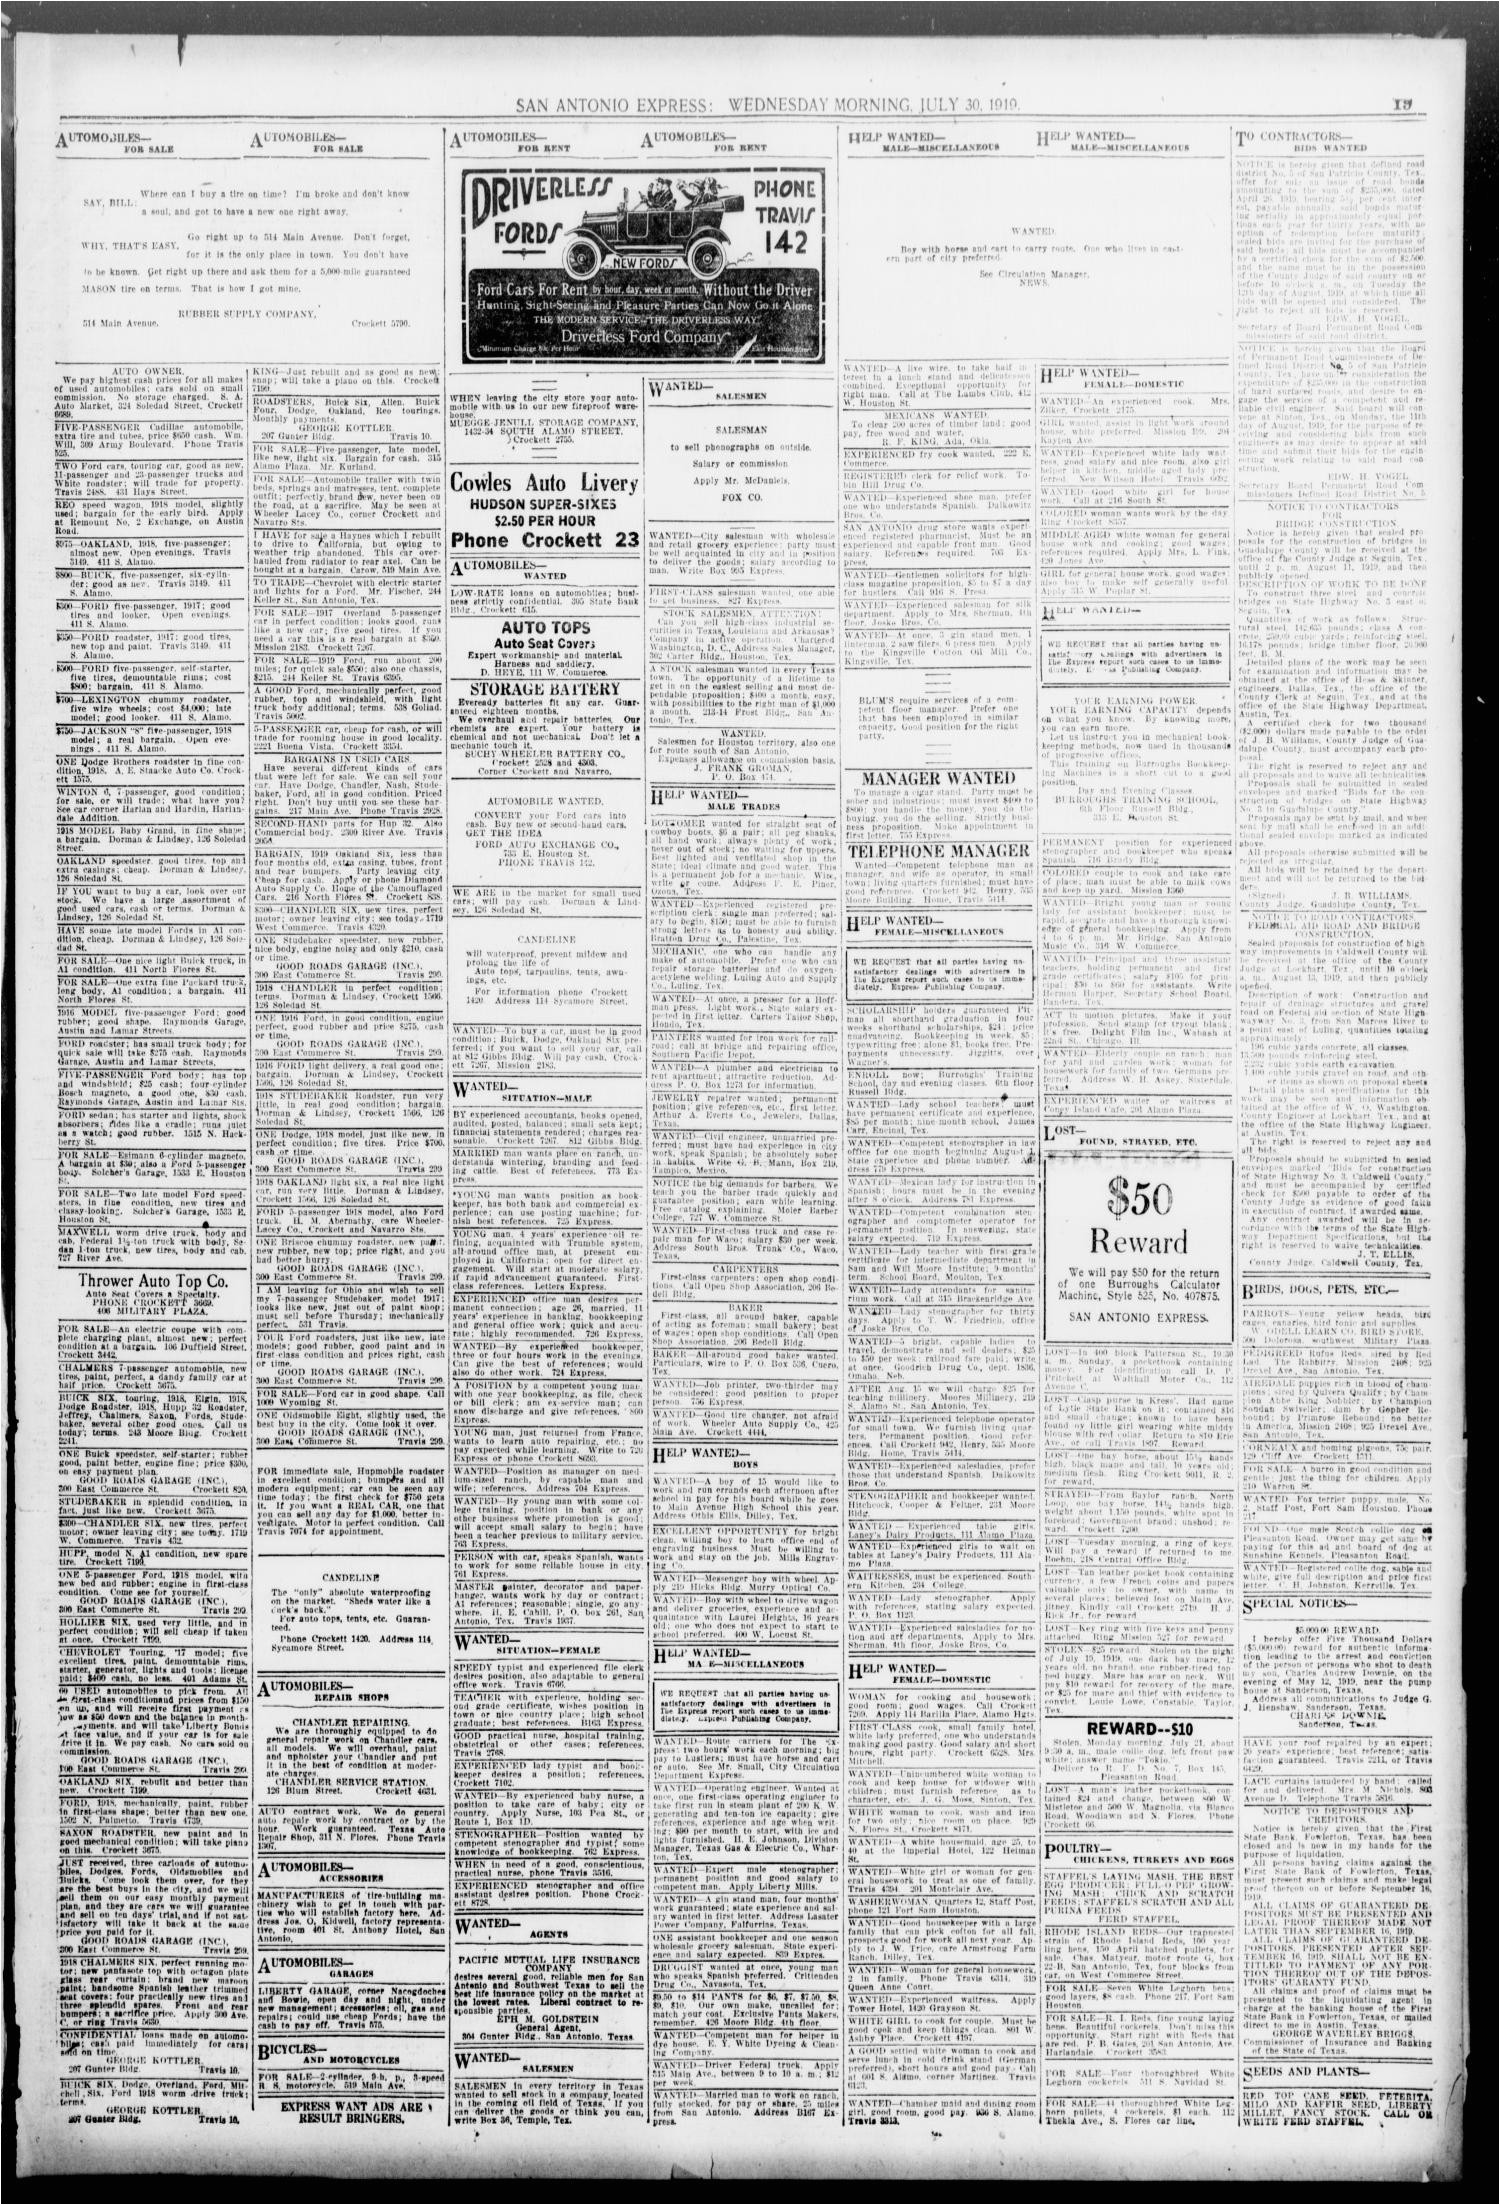 san antonio express san antonio tex vol 54 no 208 ed 1 wednesday july 30 1919 page 19 of 22 the portal to texas history